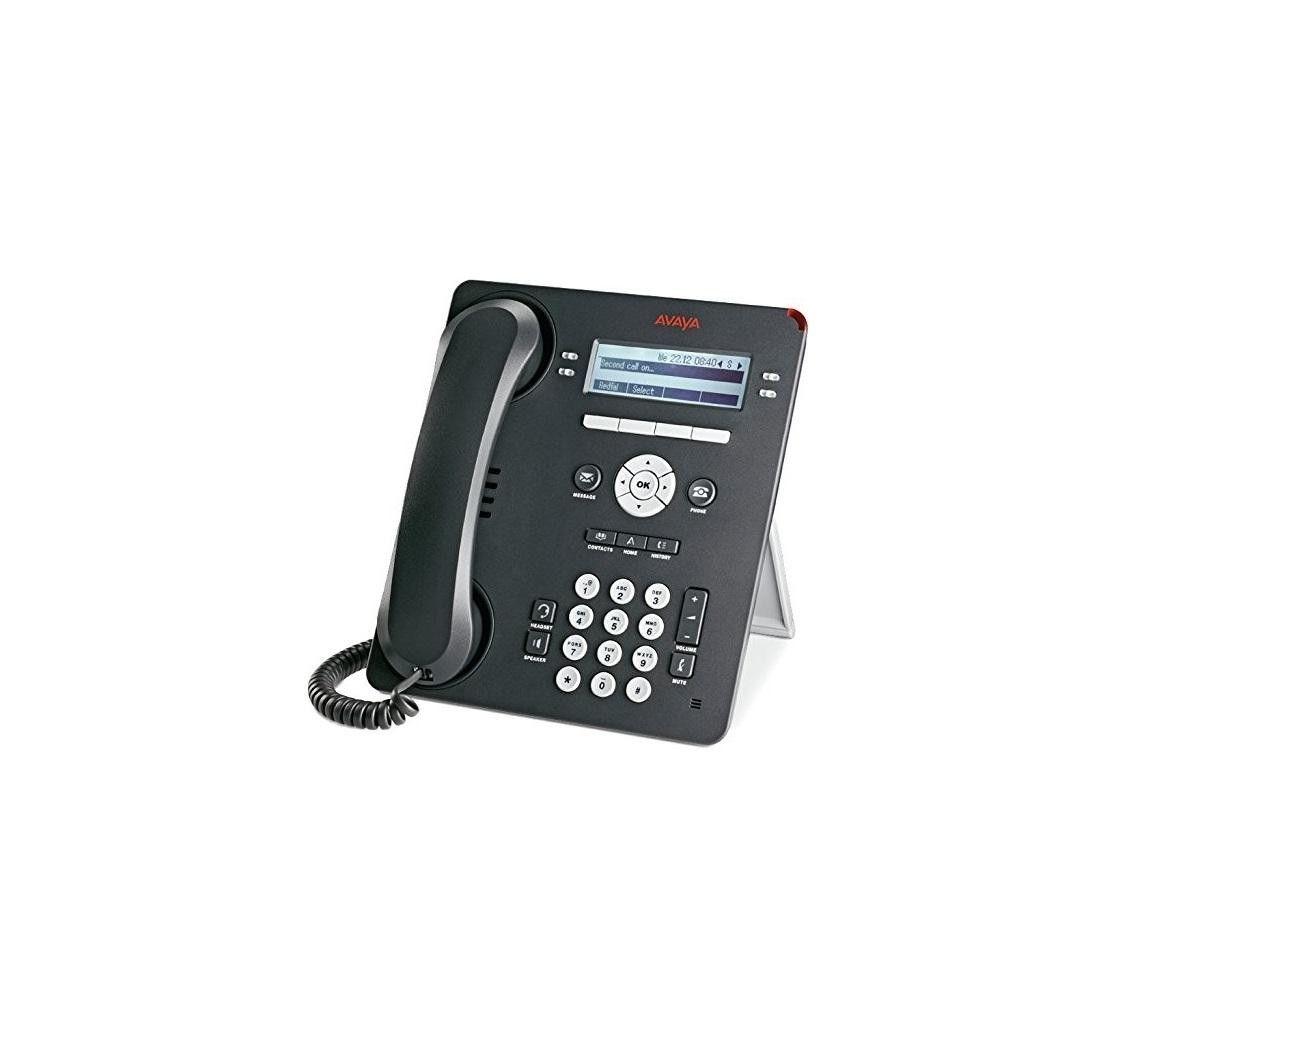 Avaya 9504 Digital Telephone Phone 700500206 For IP Office Charcoal ...